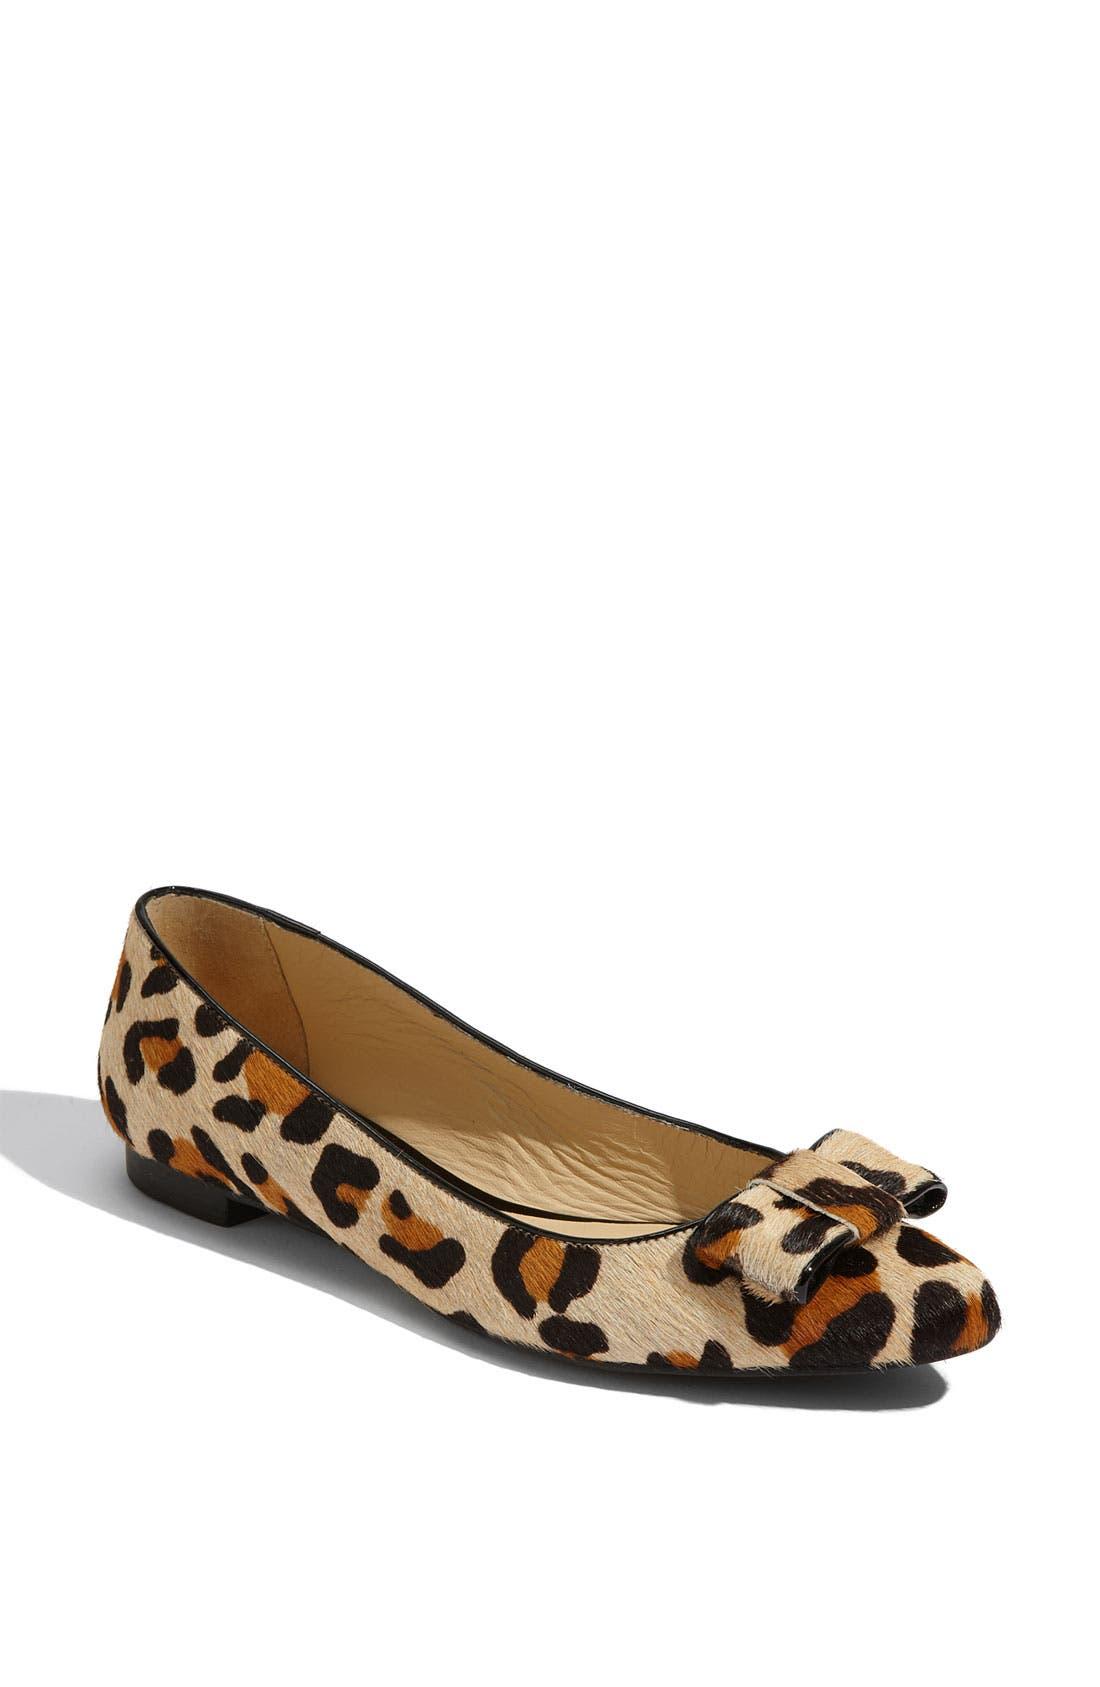 ,                             'elise' leopard print calf hair flat,                             Main thumbnail 13, color,                             960